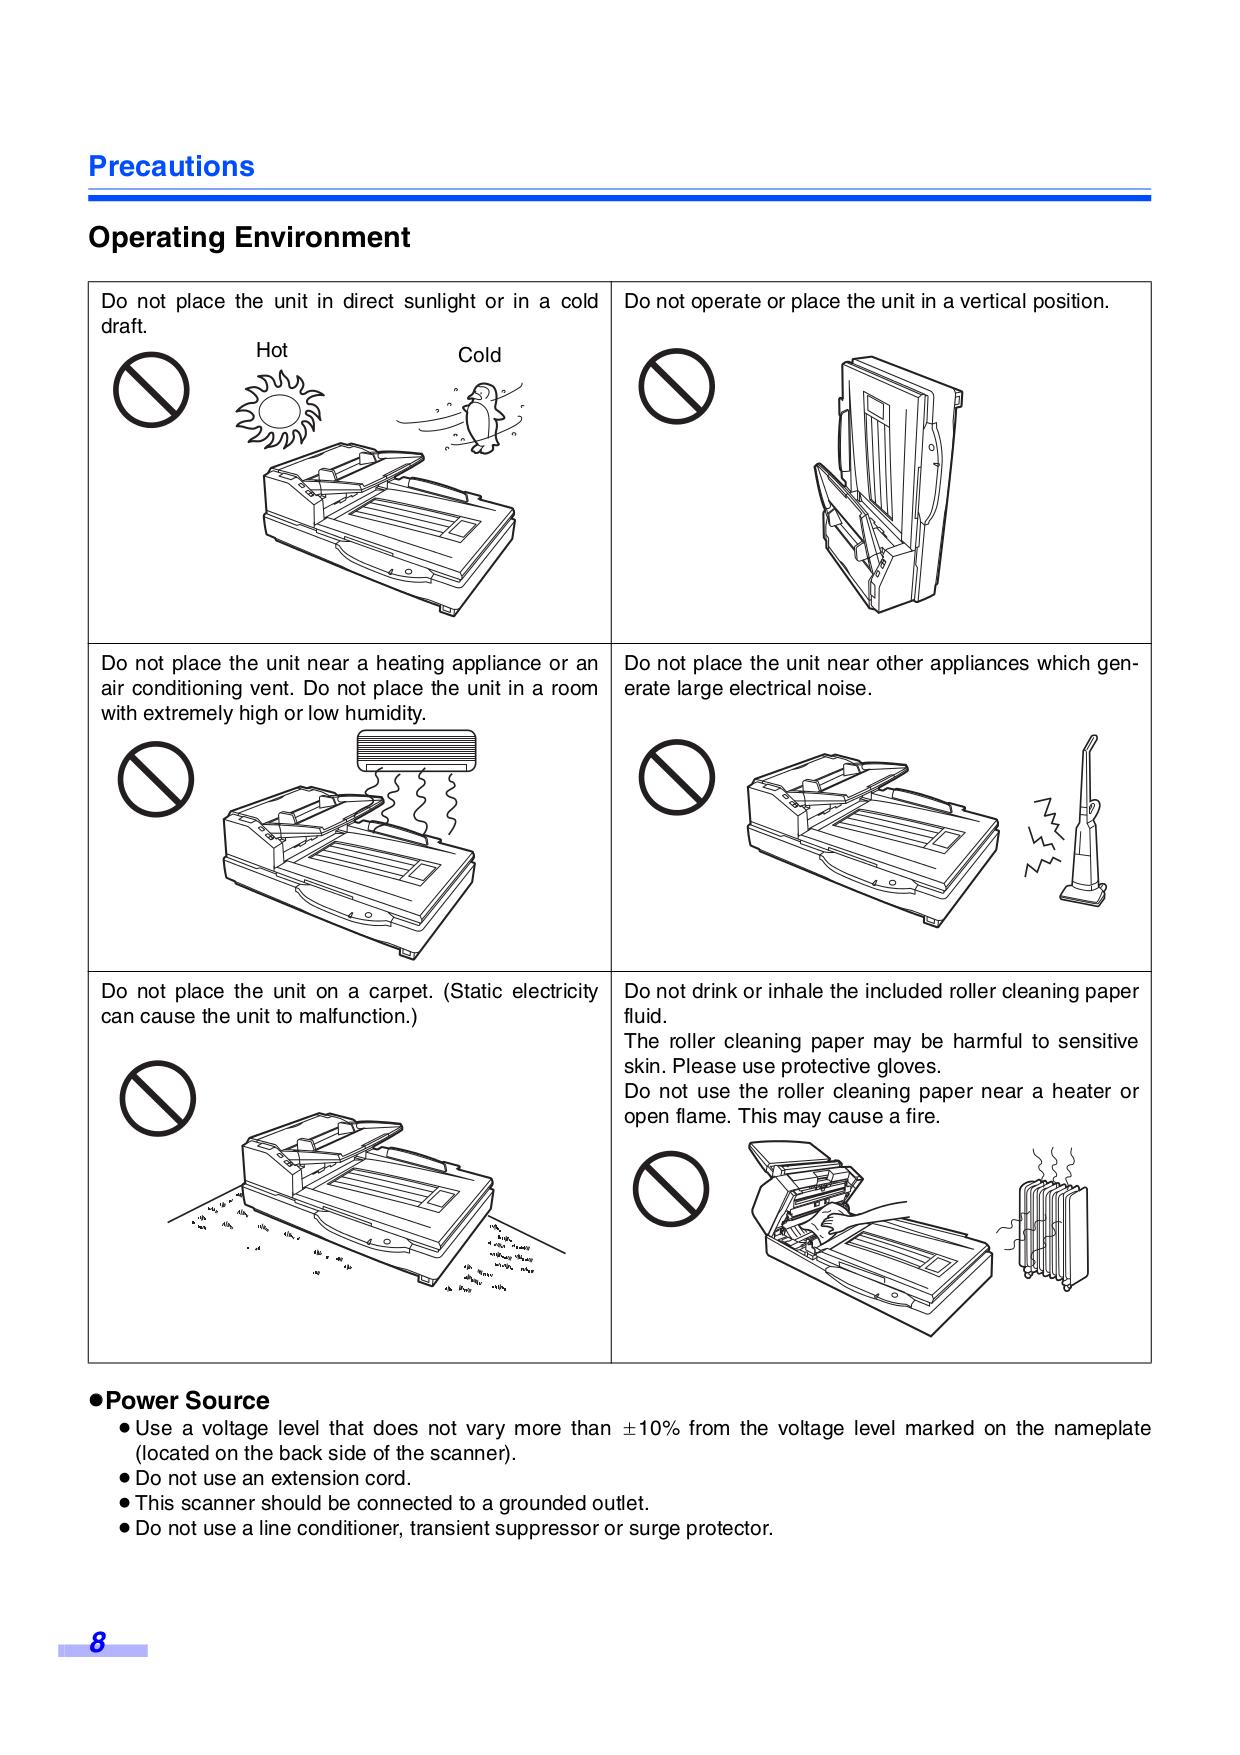 PDF manual for Panasonic Scanner KV-S7065C